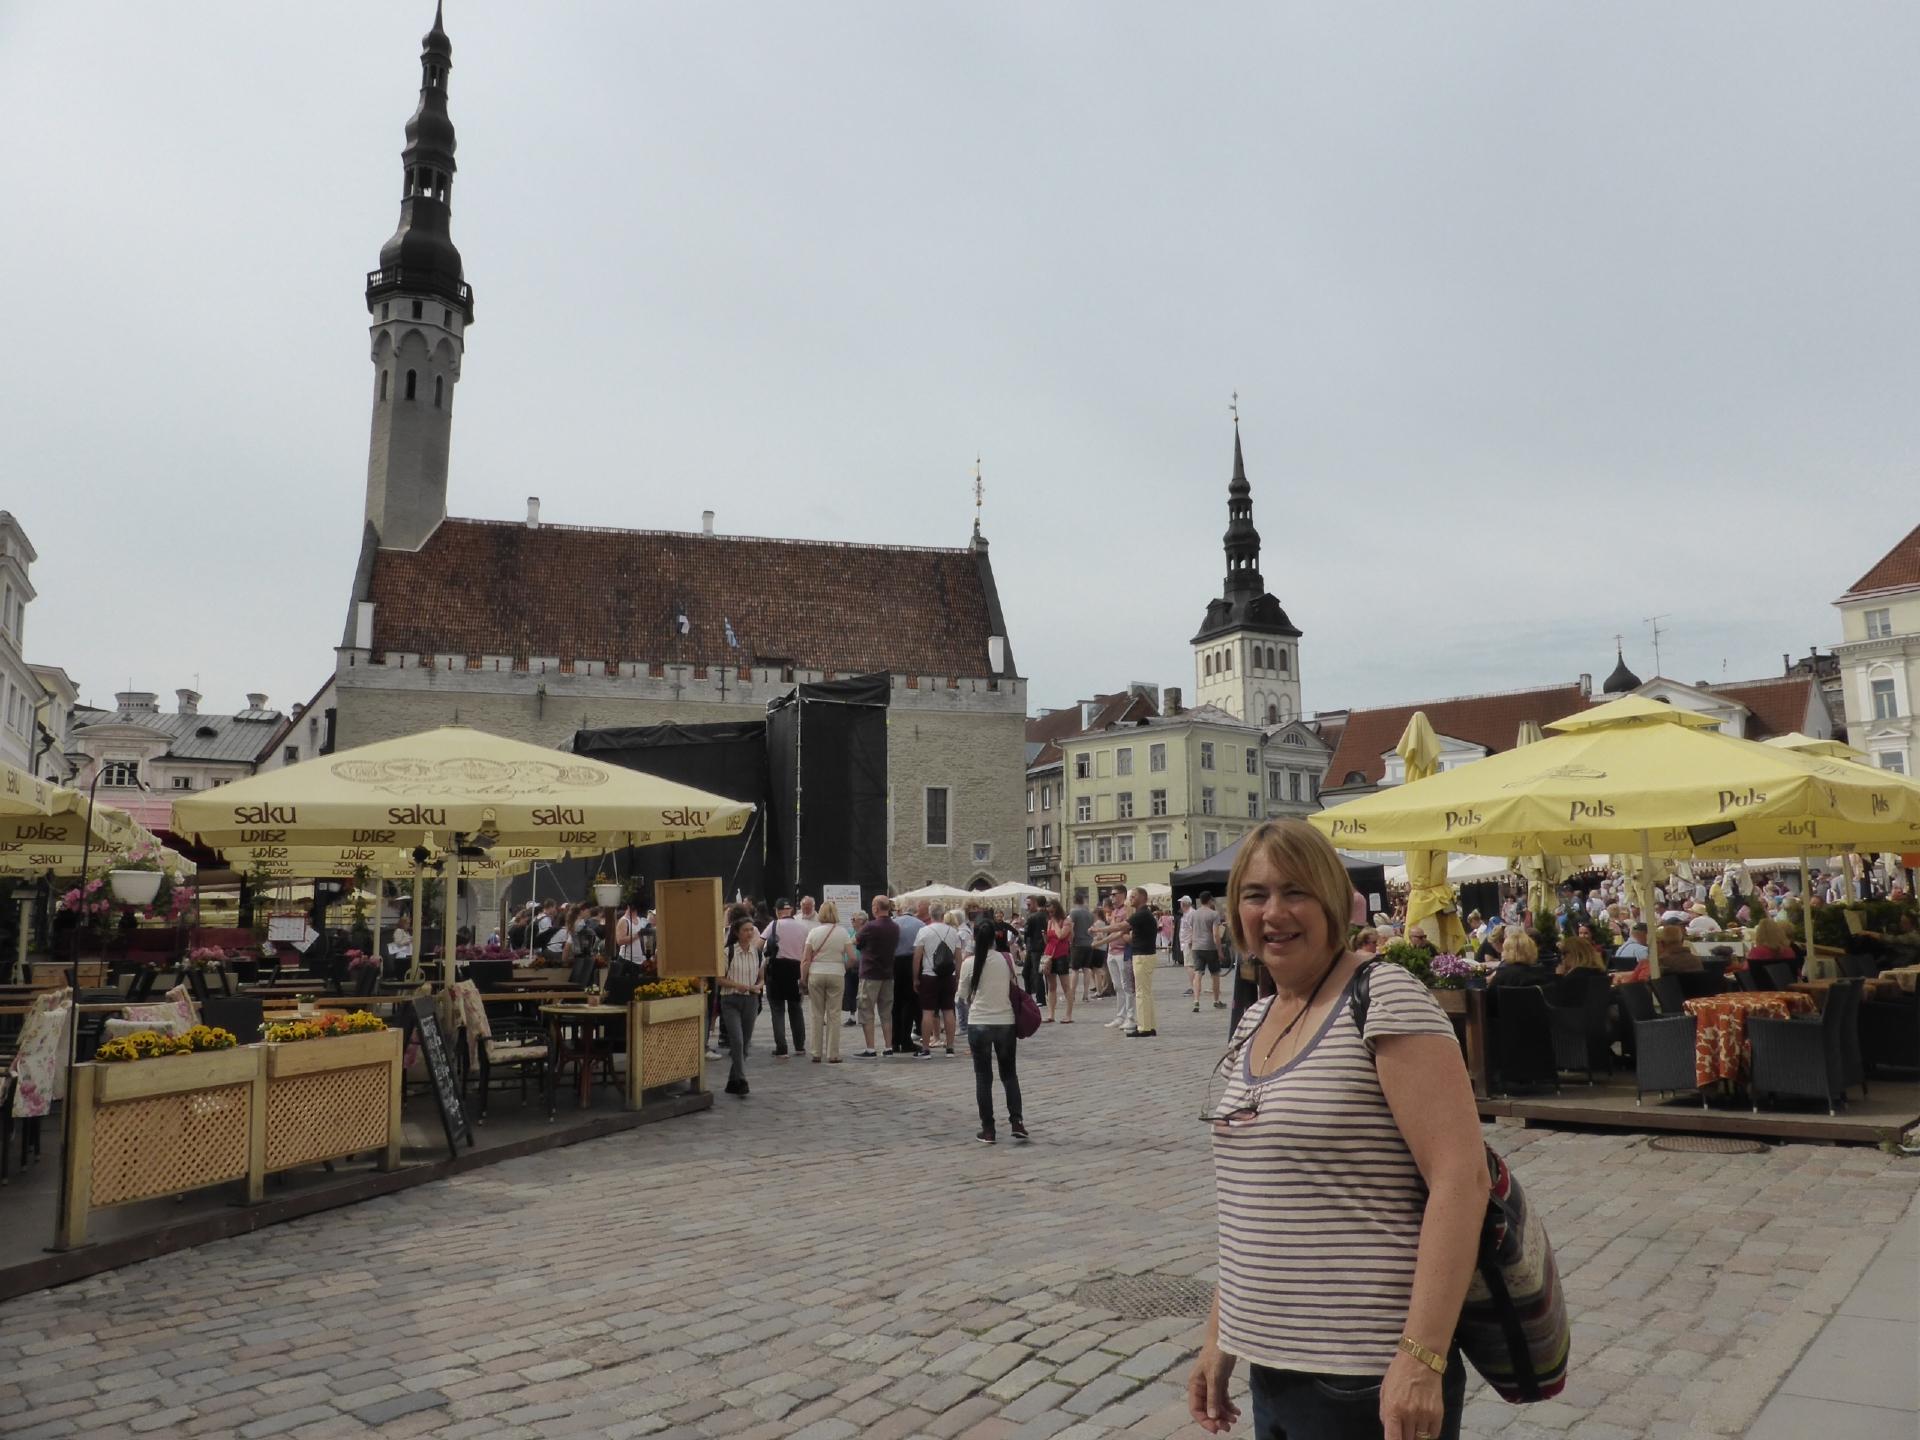 Bridget at the Town Hall Square market in Tallinn.